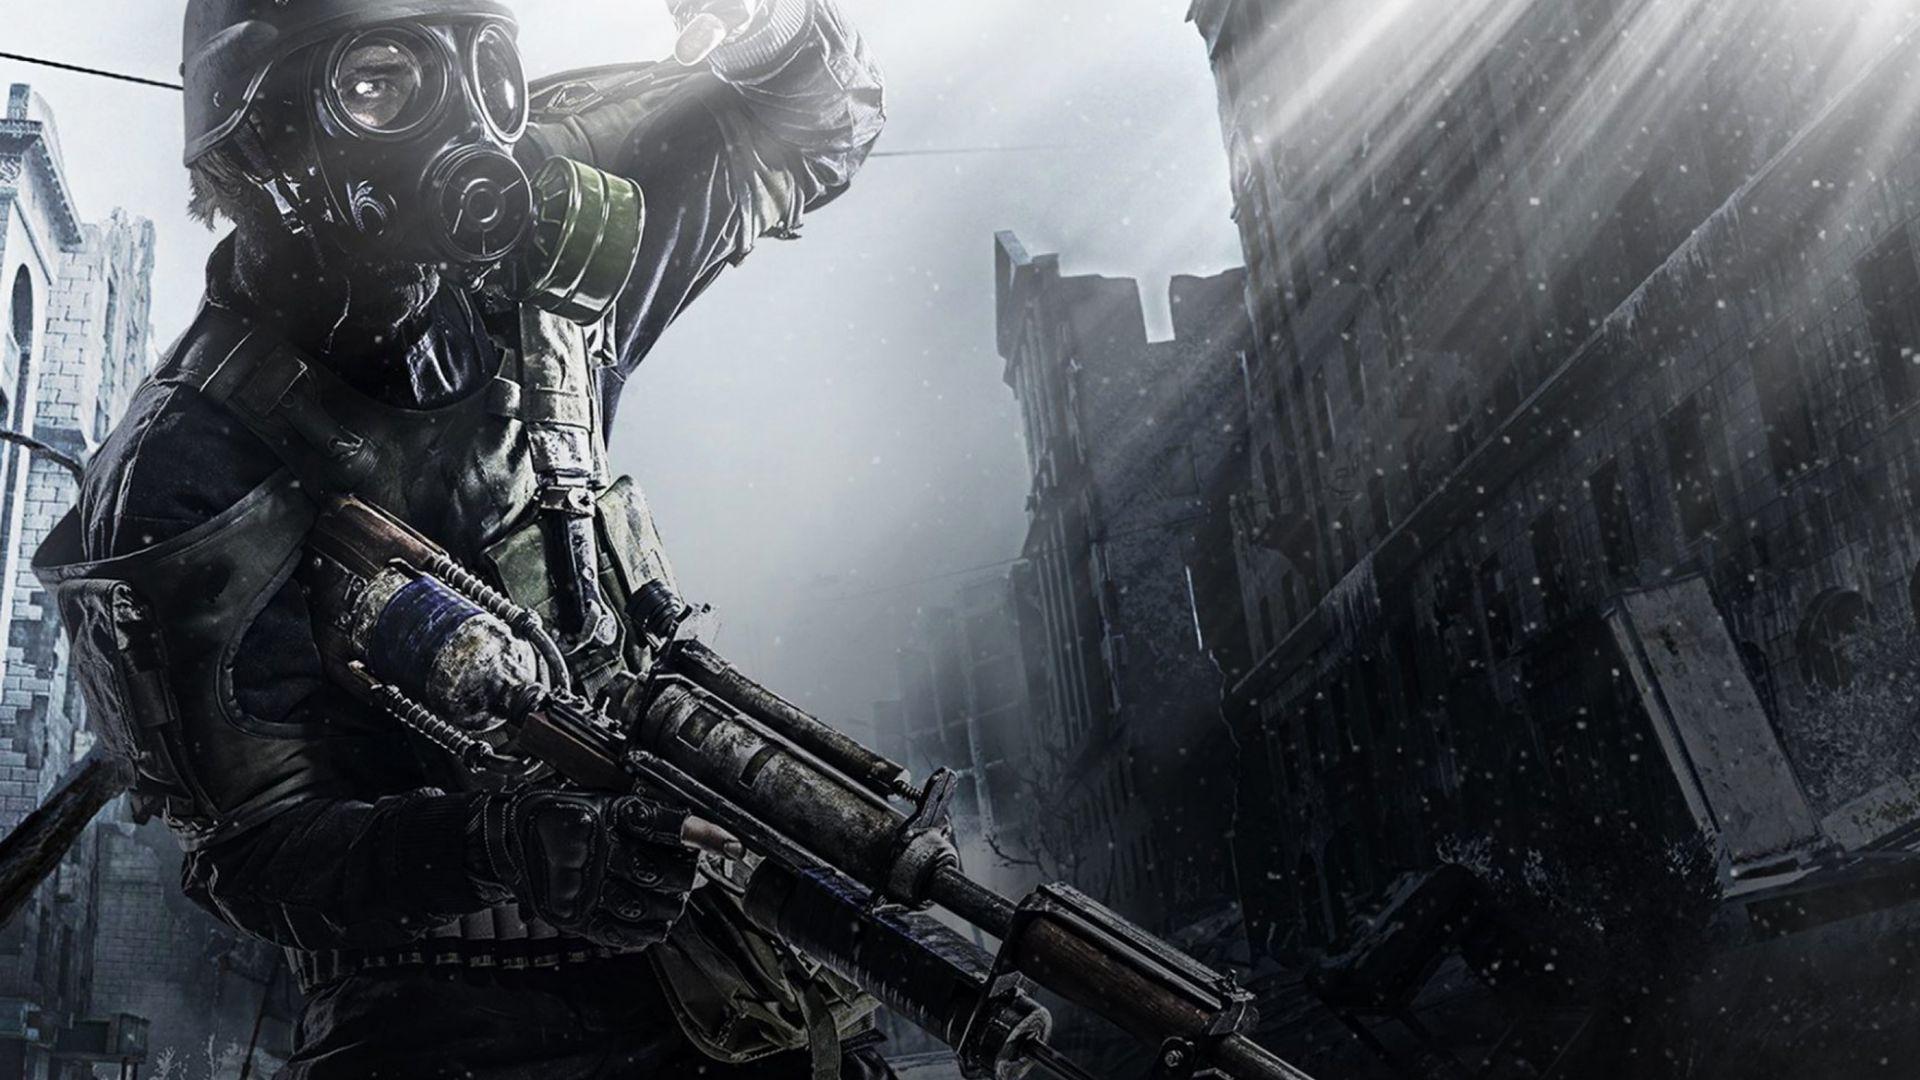 Metro 2033 Dark Soldier Video Game Wallpaper